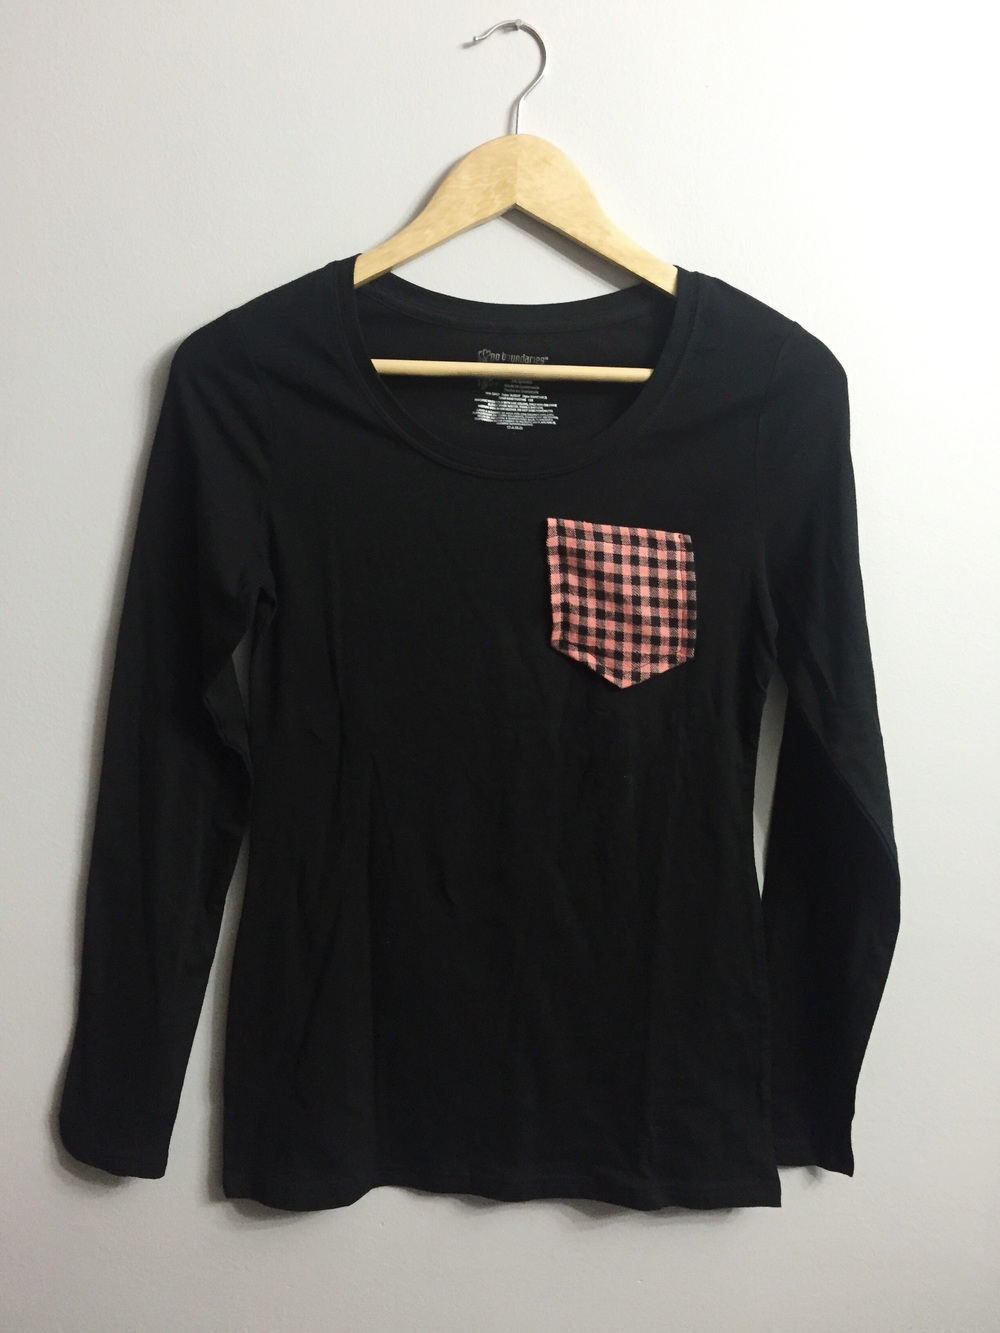 DIY Simple Pocket Tshirt (click through for tutorial)